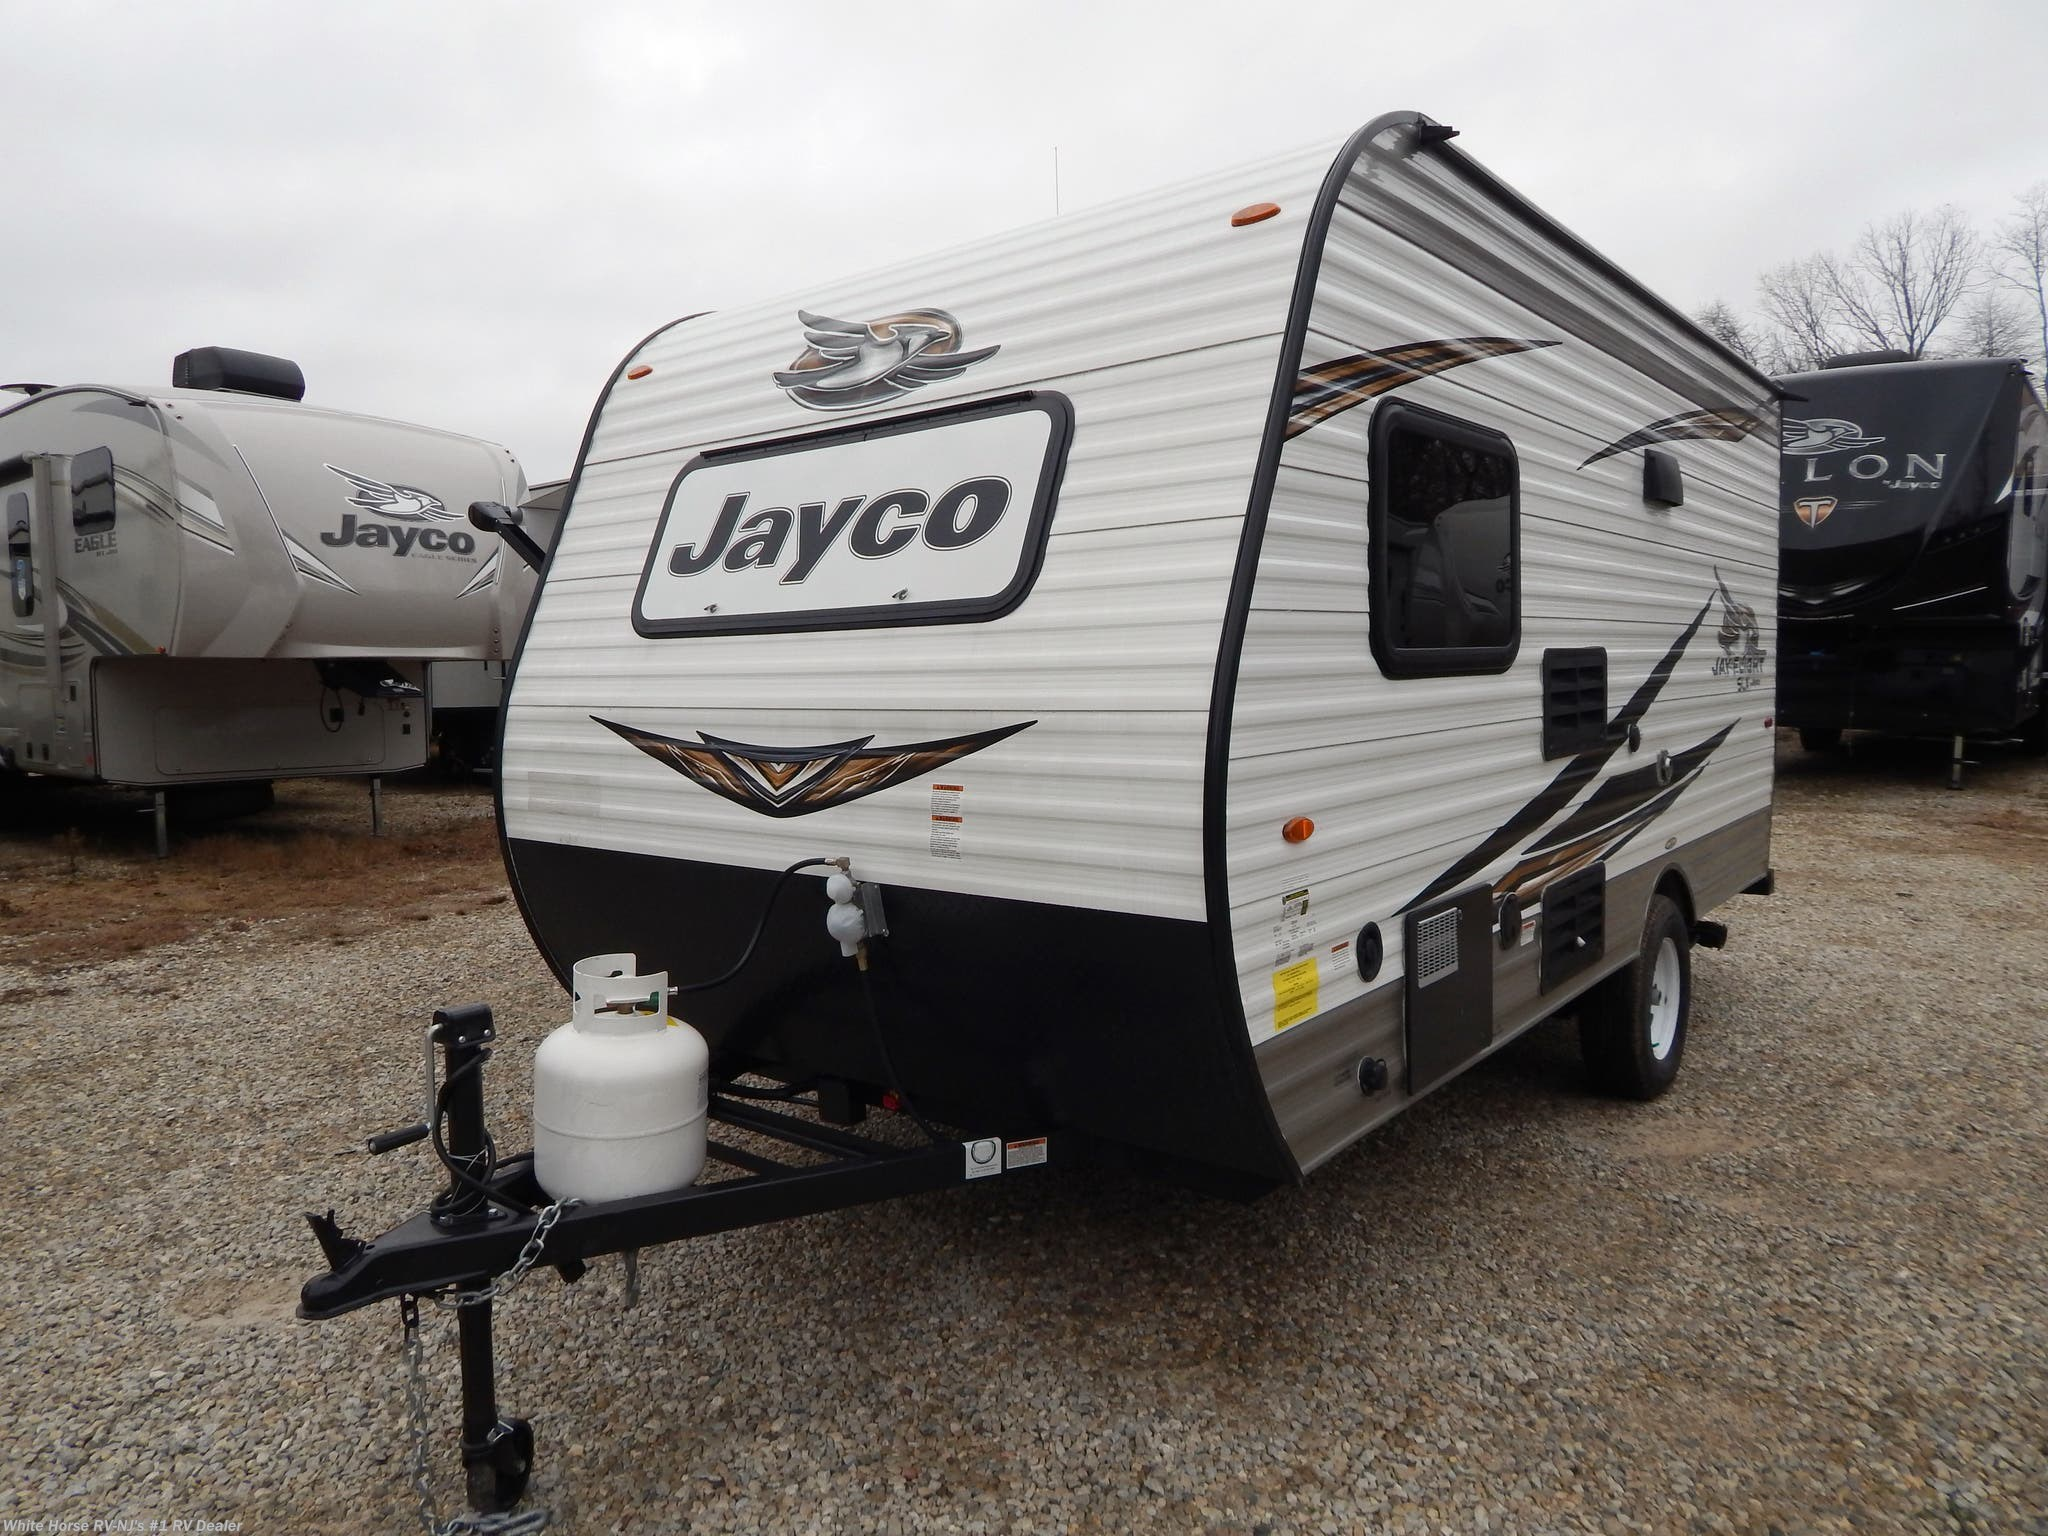 2019 Jayco RV Jay Flight SLX 154BH Front Dinette/Bed w/Corner Bunks for  Sale in Williamstown, NJ 08094 | J12316